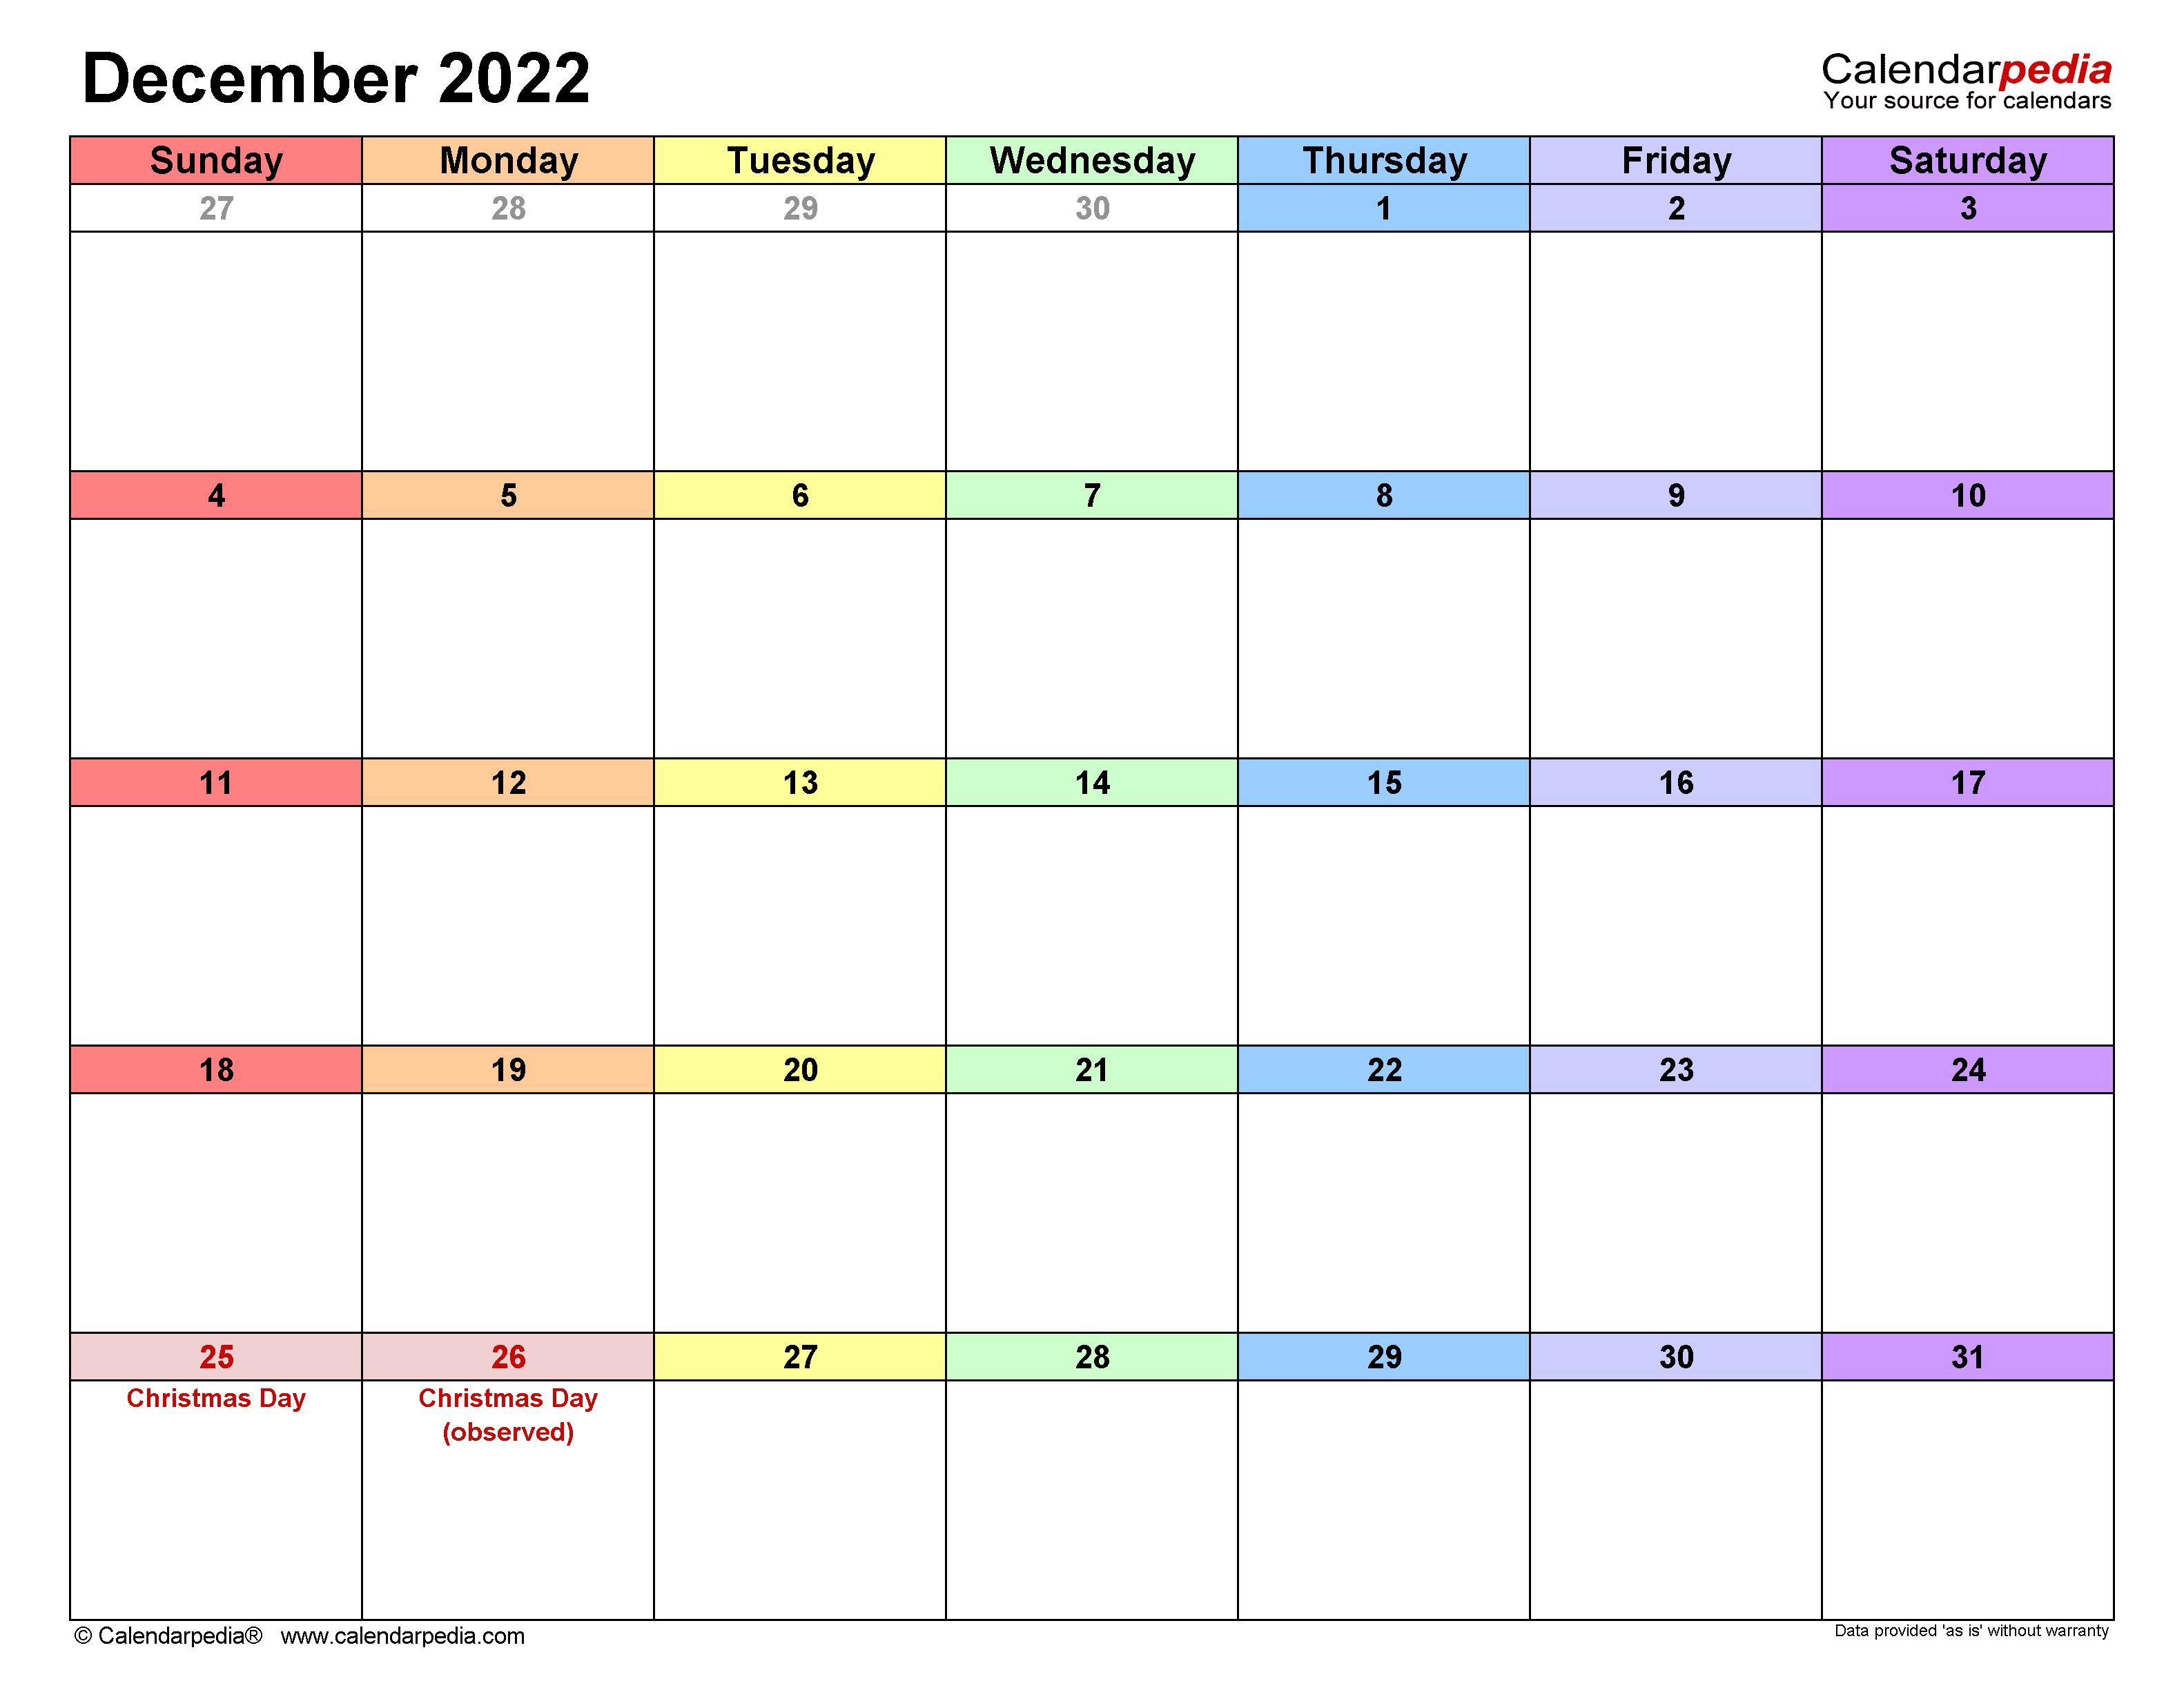 Editable Calendar December 2022.December 2022 Calendar Templates For Word Excel And Pdf